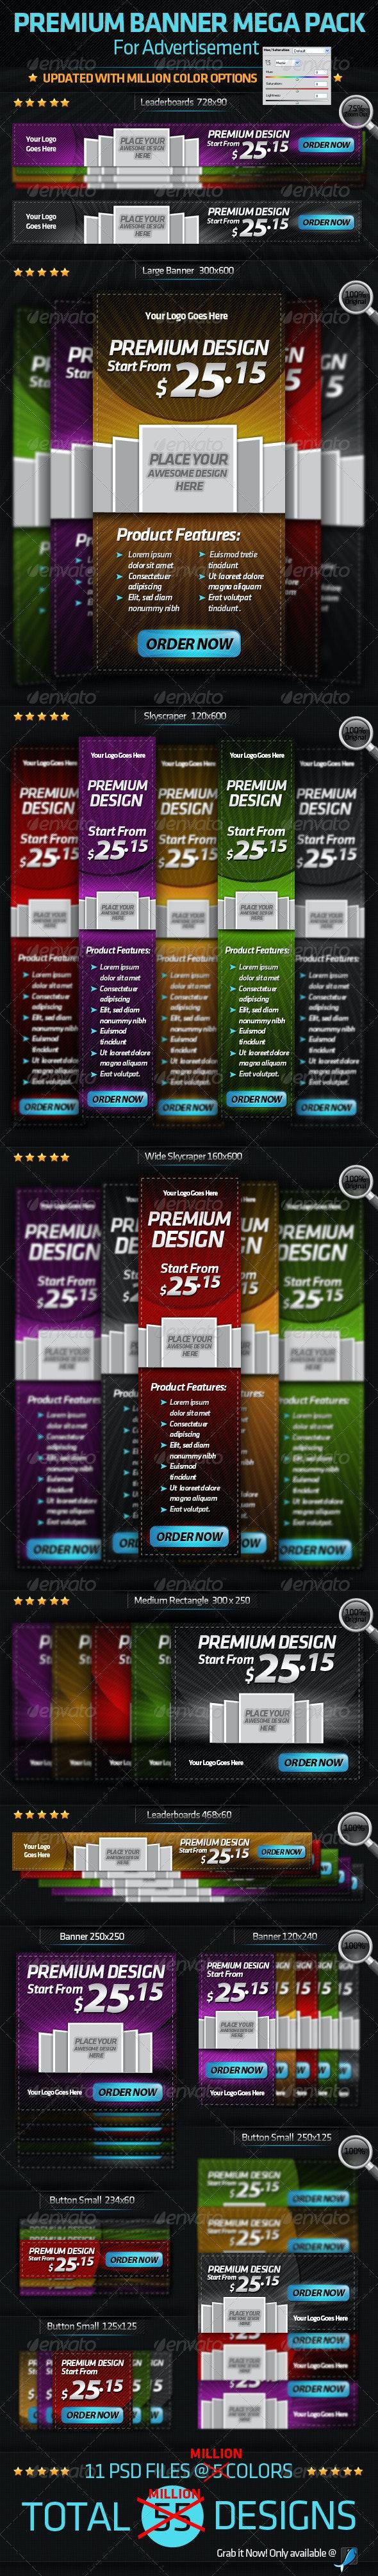 Premium Banner-Mega Pack-For Online Advertisement - Banners & Ads Web Elements